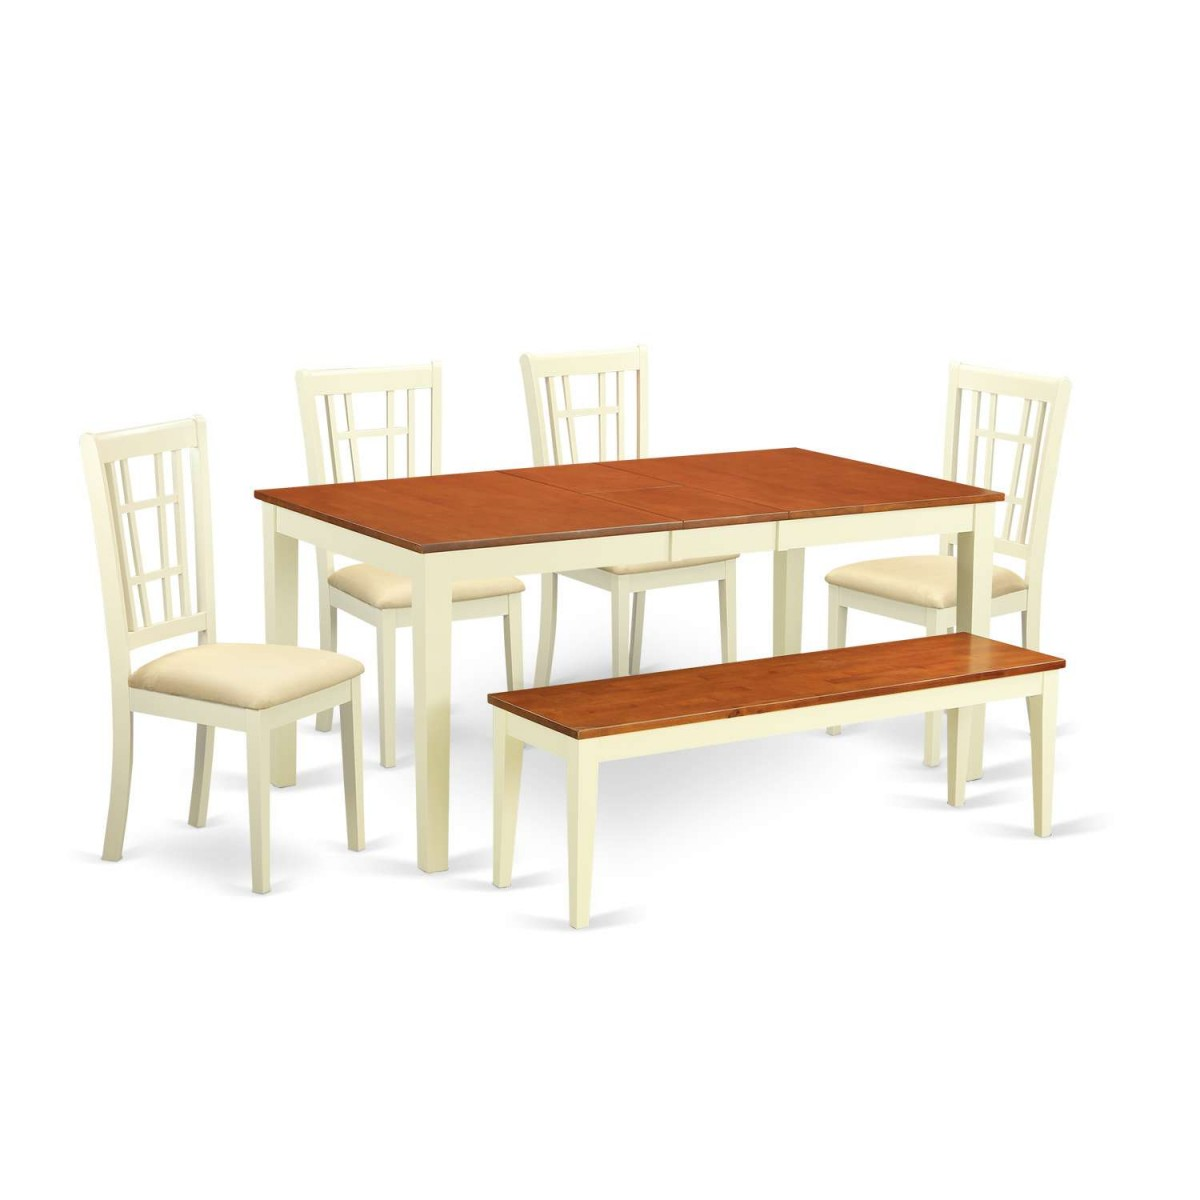 East West Nicoli 6 Piece Dining Set